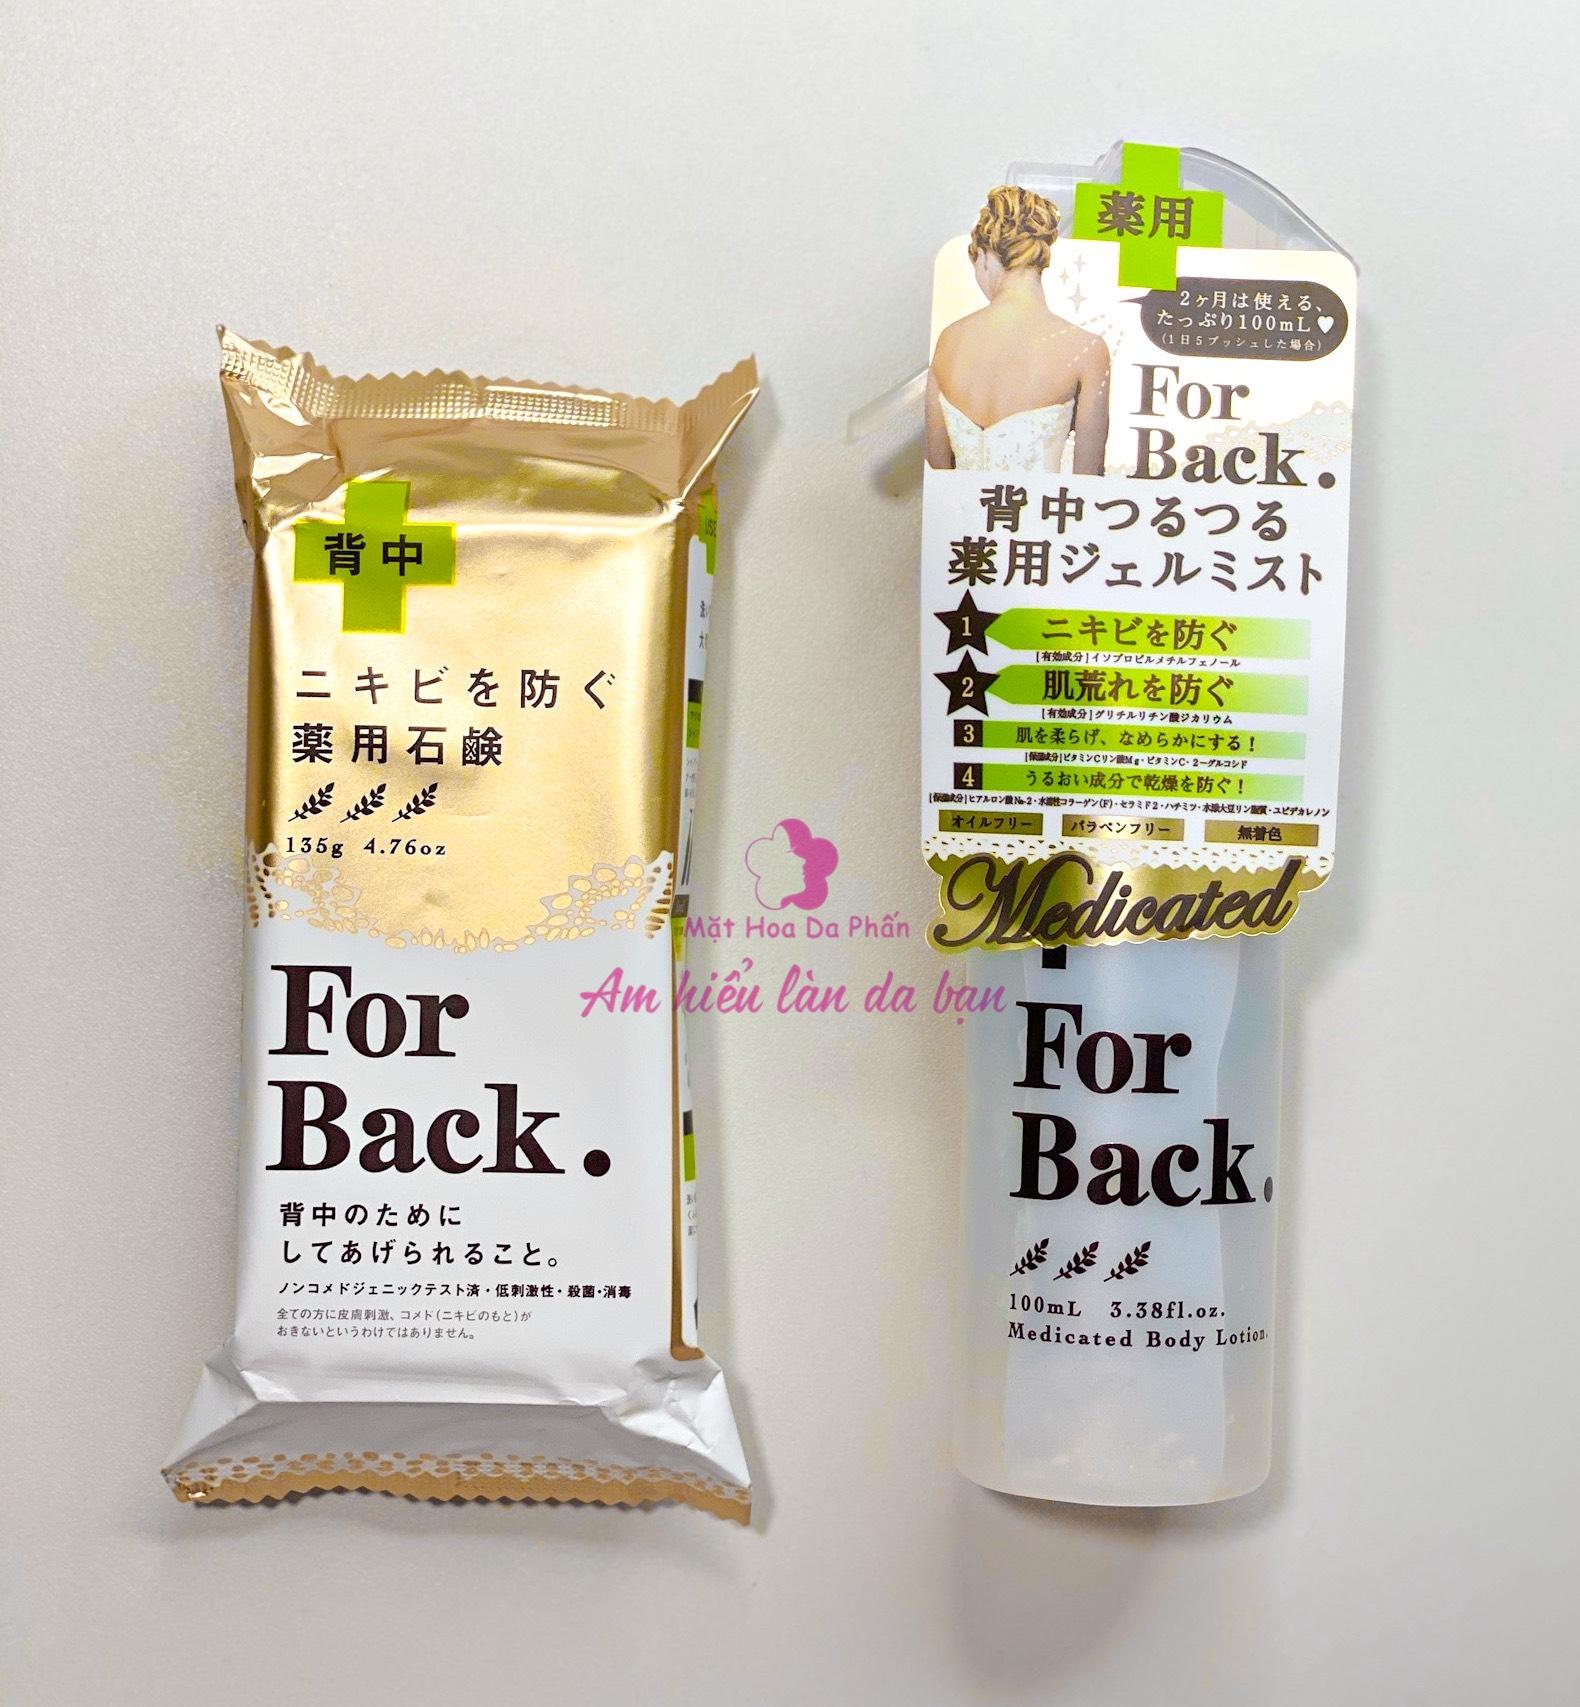 Dưỡng Thể For Back Medicated Body Lotion (Dạng Xịt) 100ml